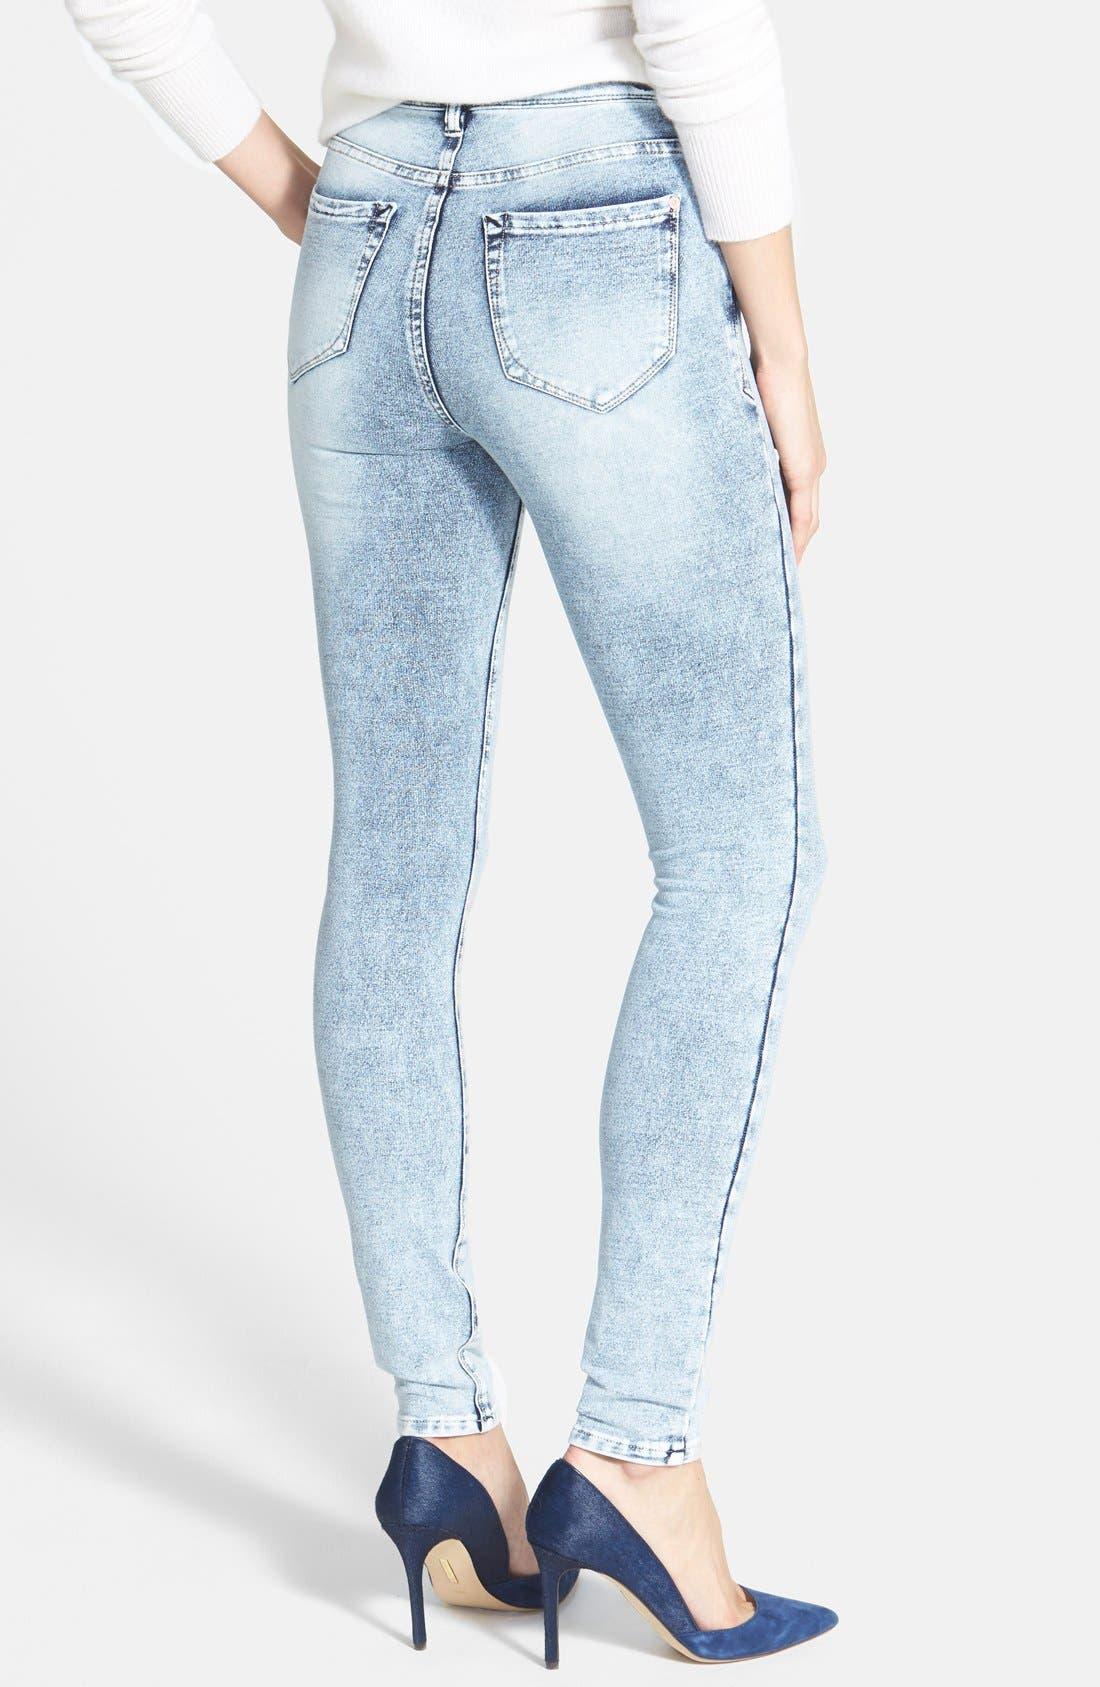 Alternate Image 2  - kensie 'Ankle Biter' Acid Wash French Terry Skinny Jeans (Grey Acid)